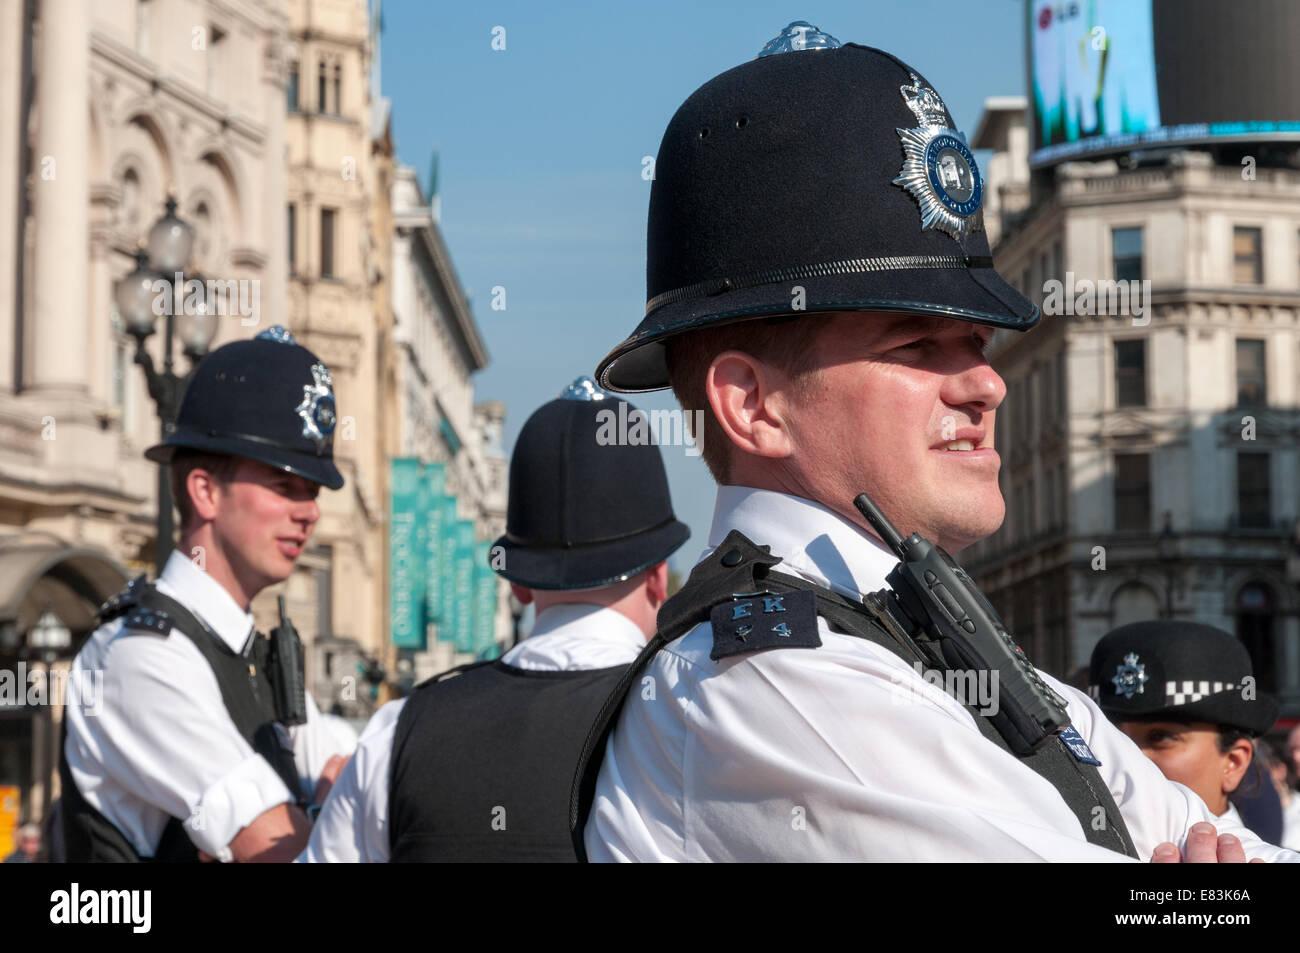 Metropolitan Police, London, England, UK - Stock Image